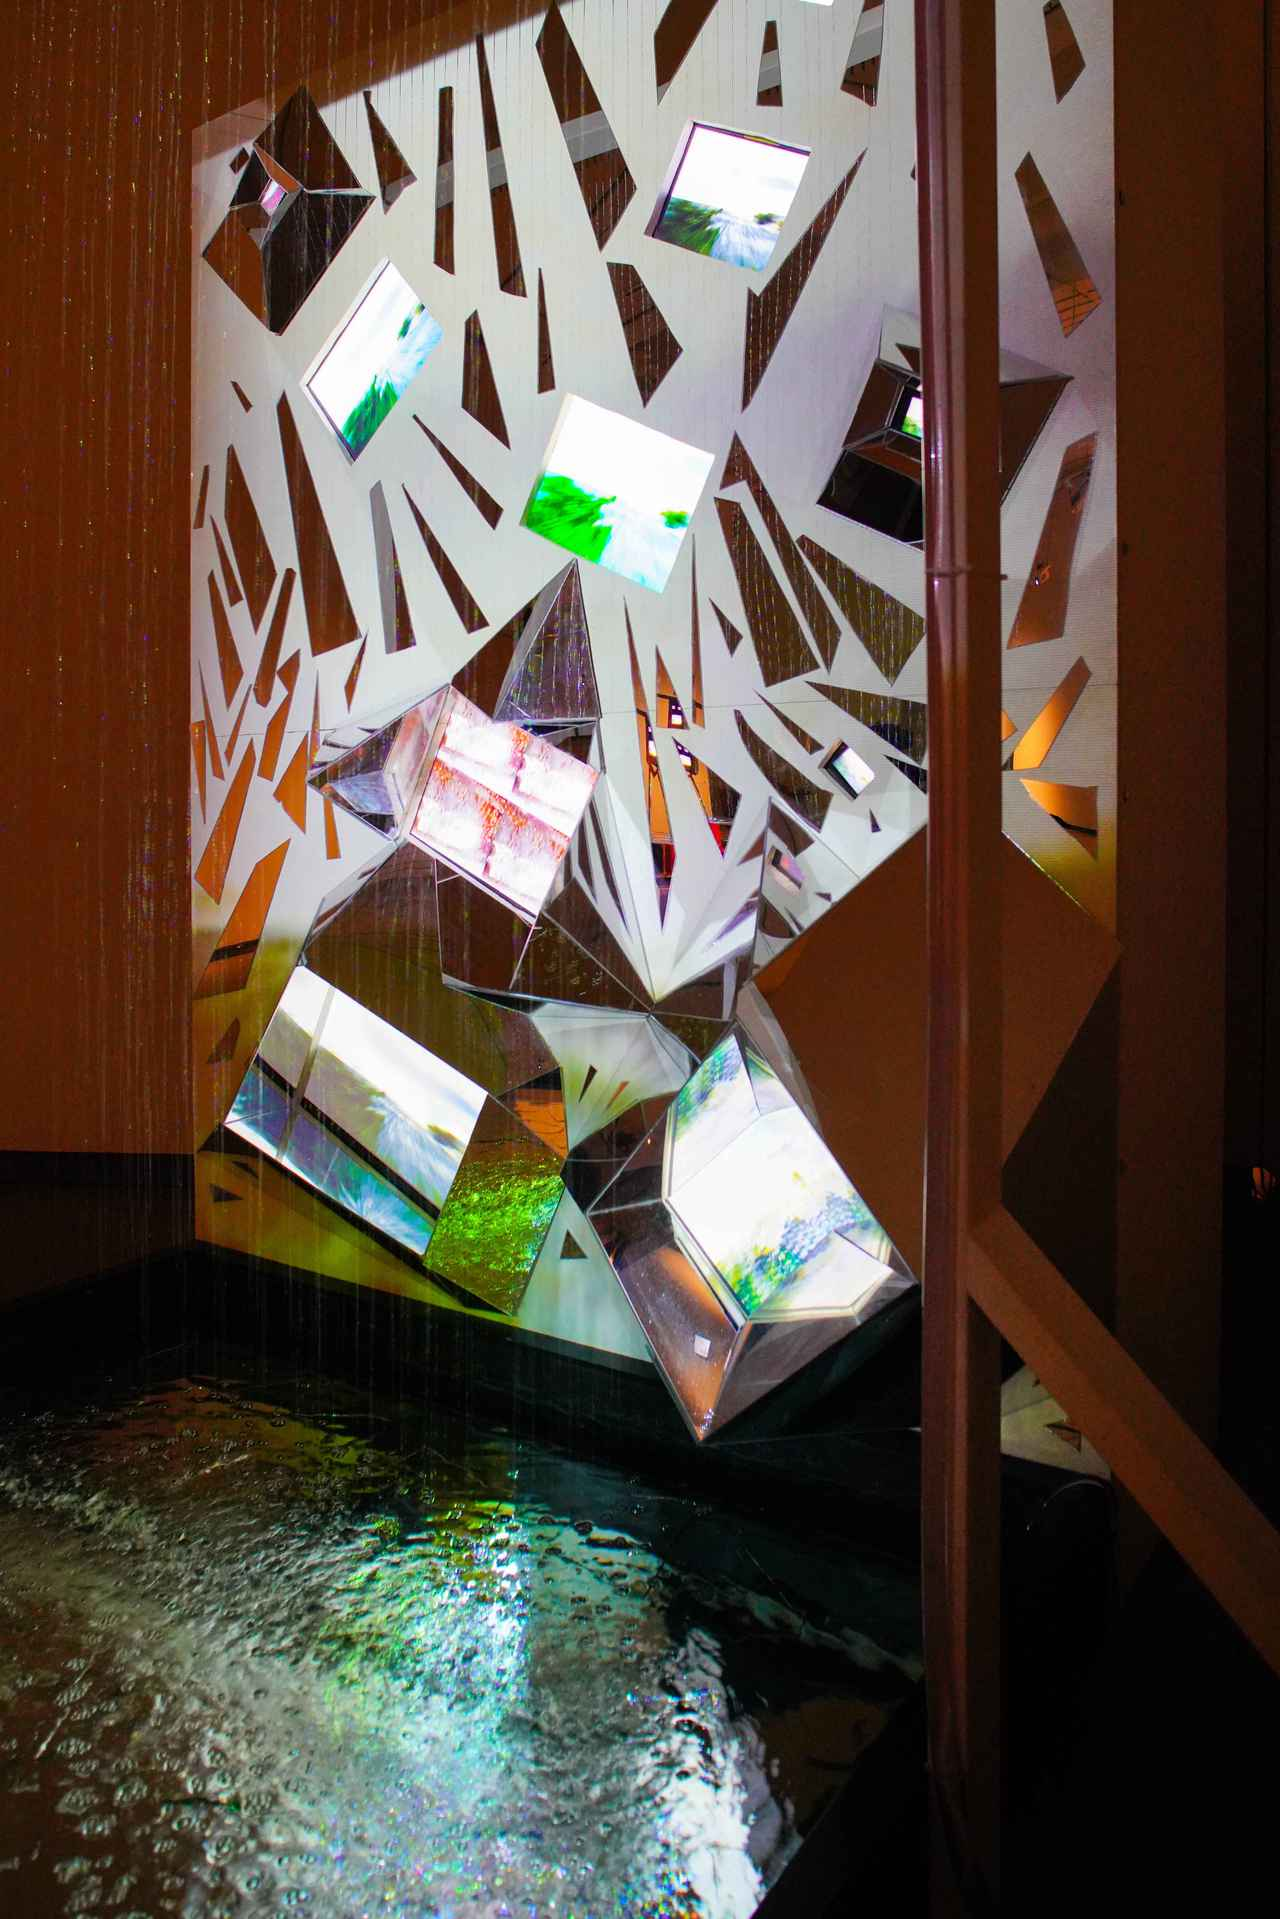 Images : 『Viva Video! 久保田成子展』|国立国際美術館